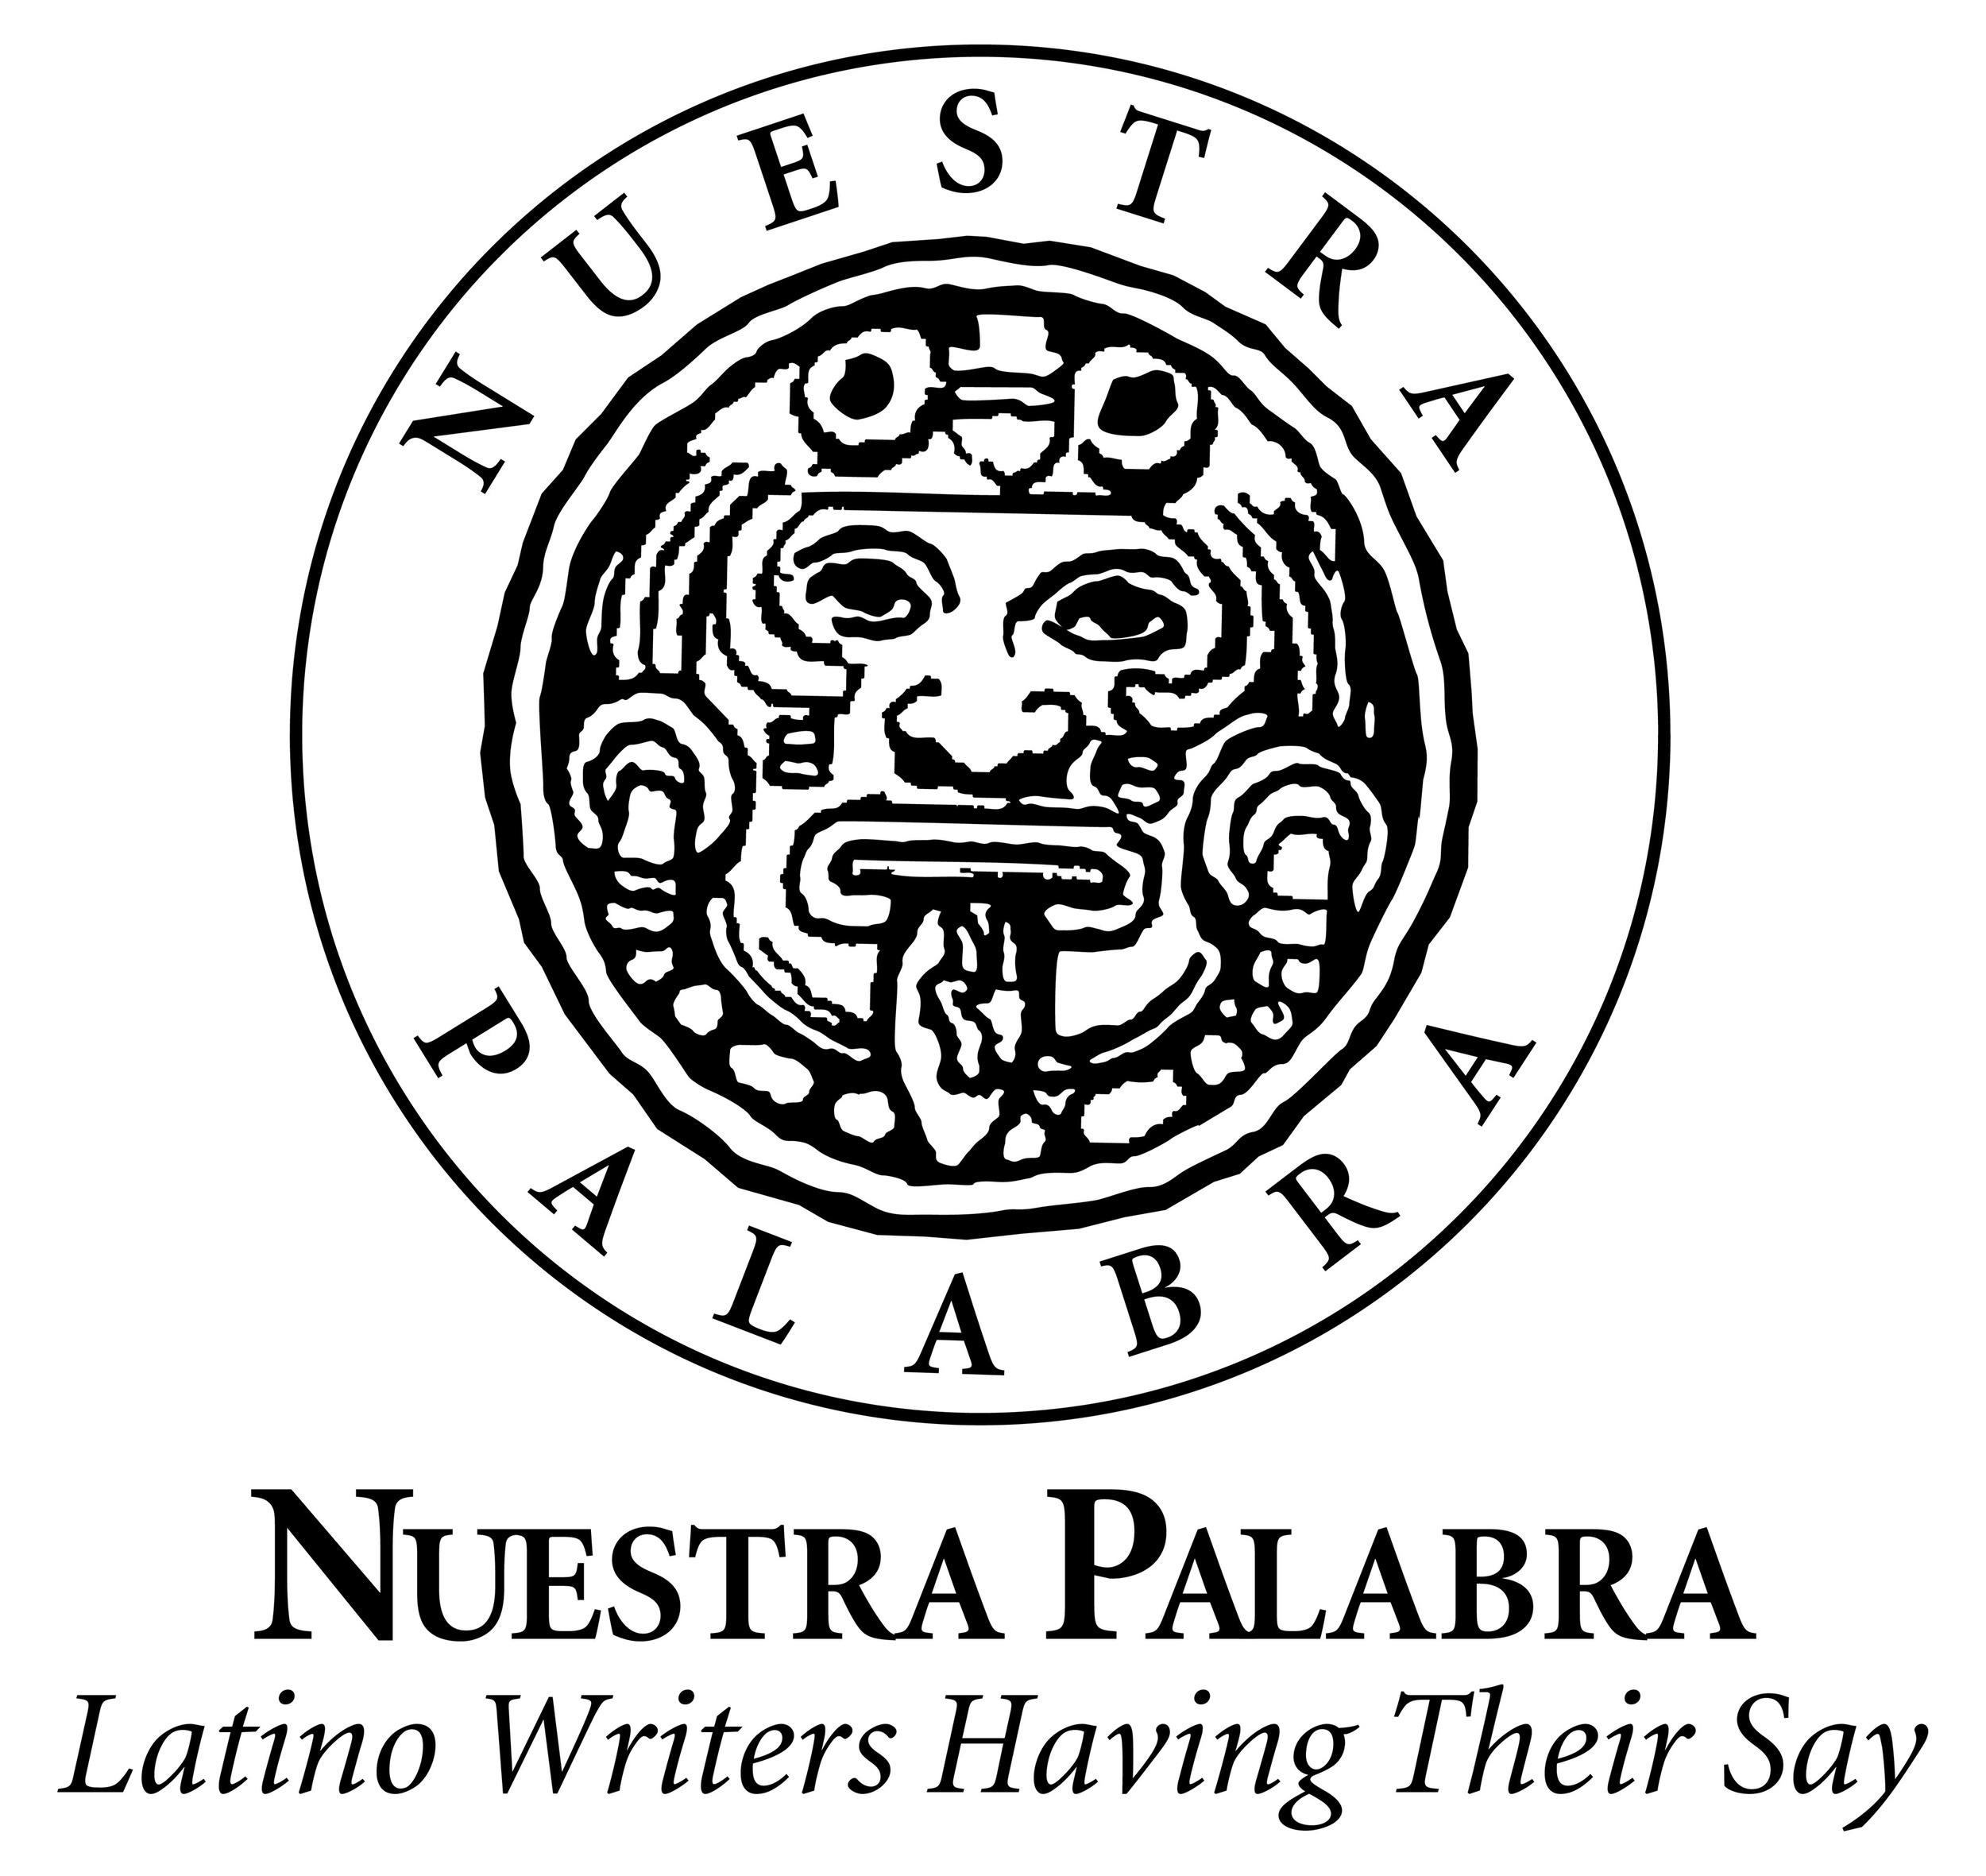 NP Square Logo.jpg